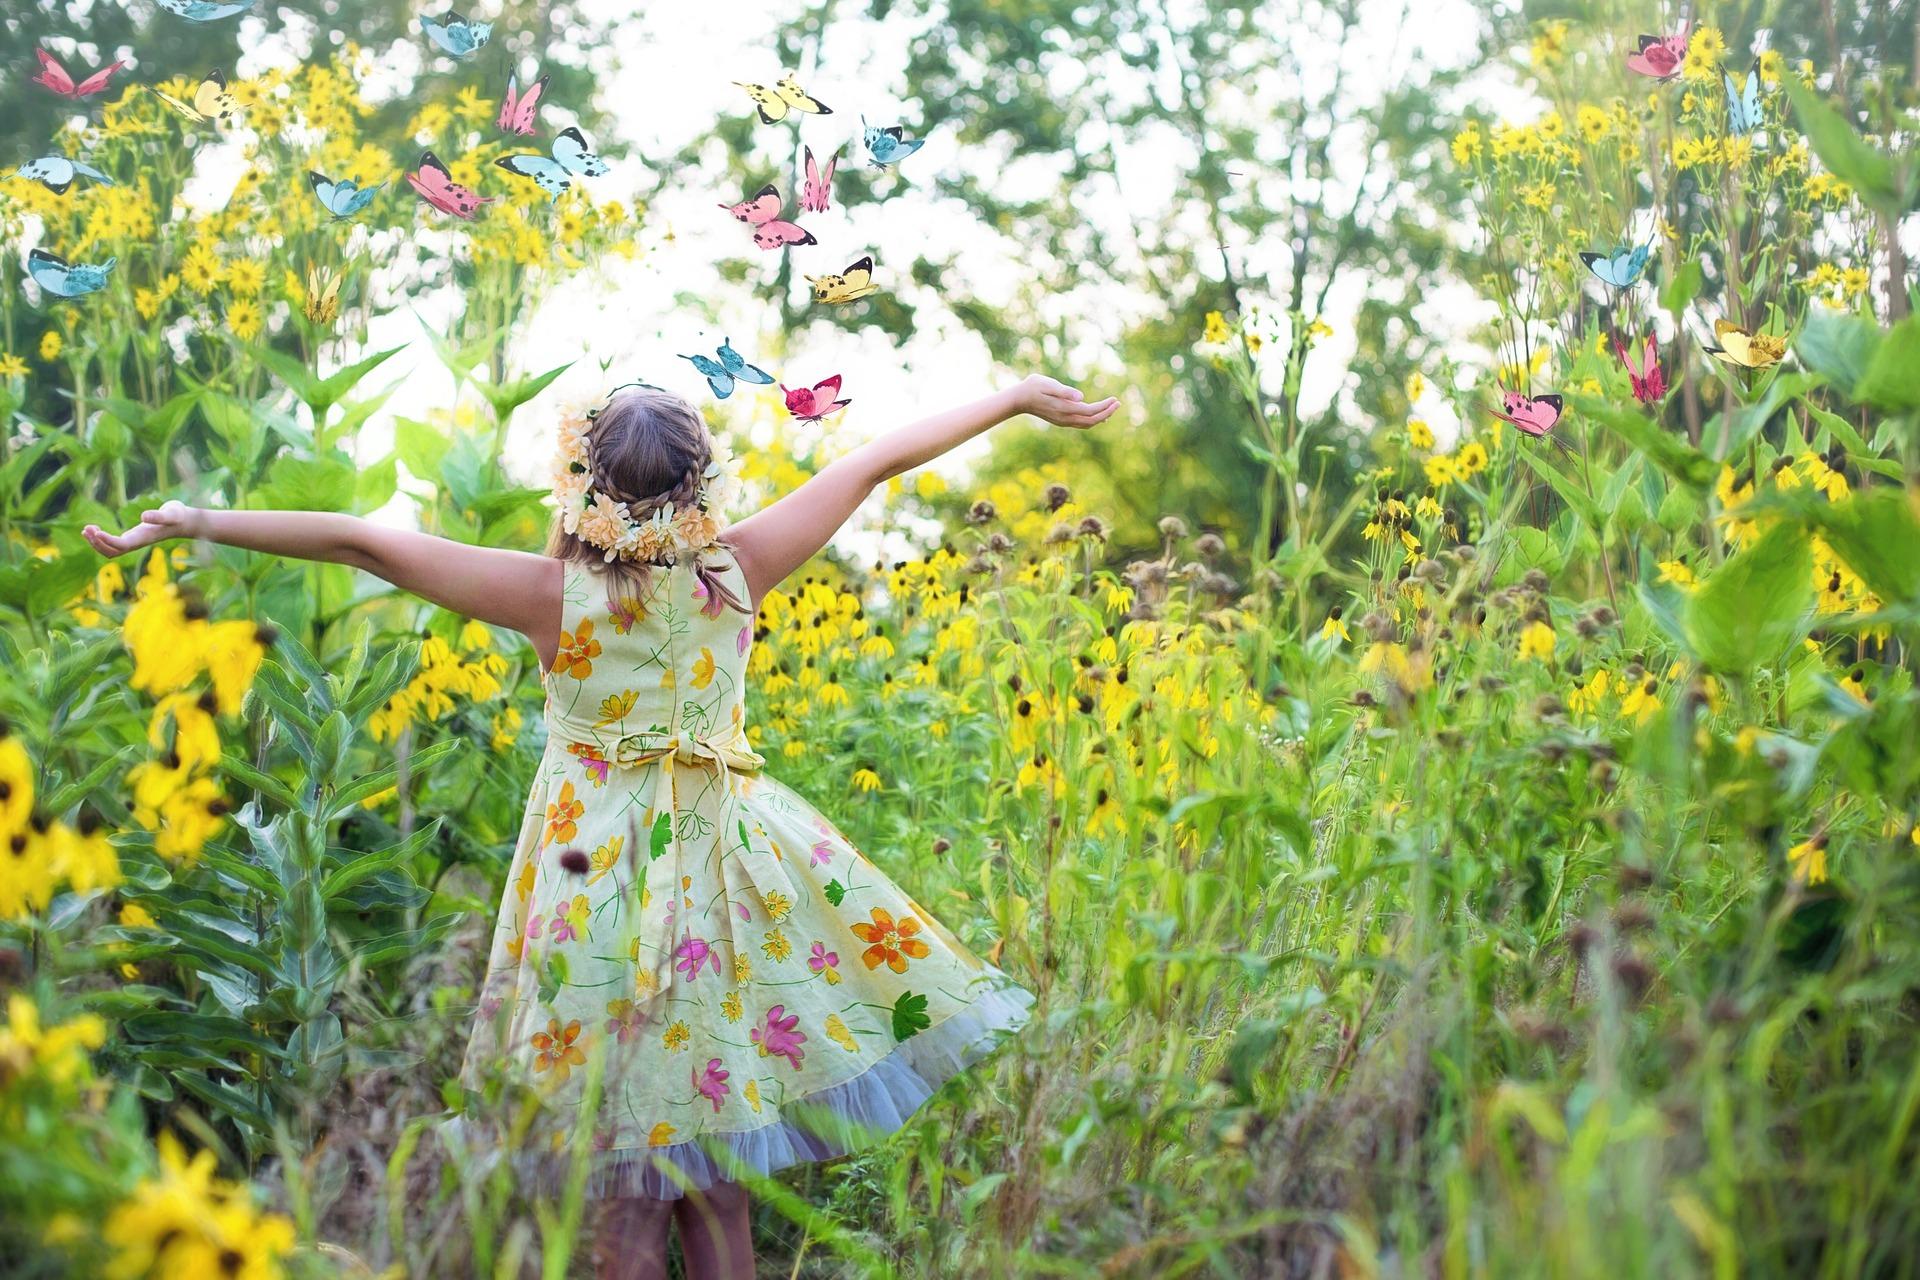 Gardening for wellness - UK Trends 2020